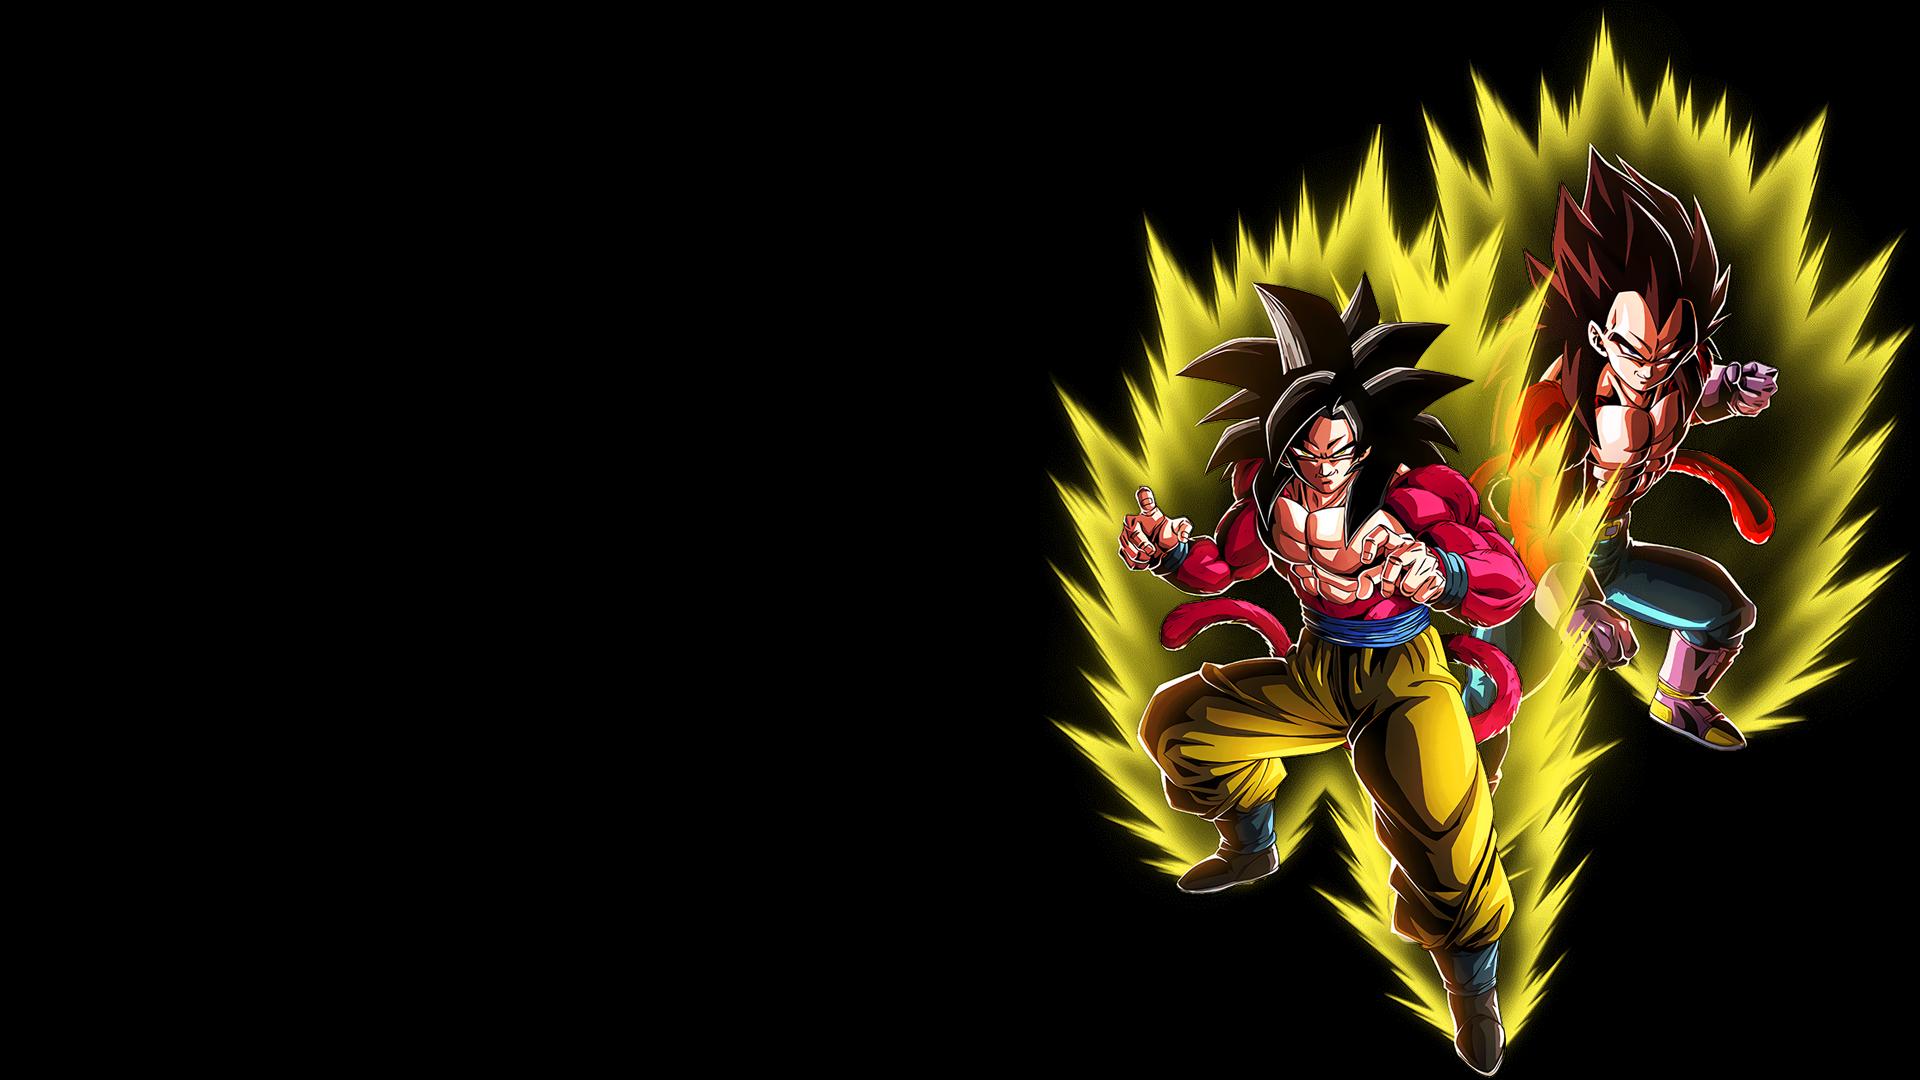 1080p Goku And Vegeta Wallpaper 4k